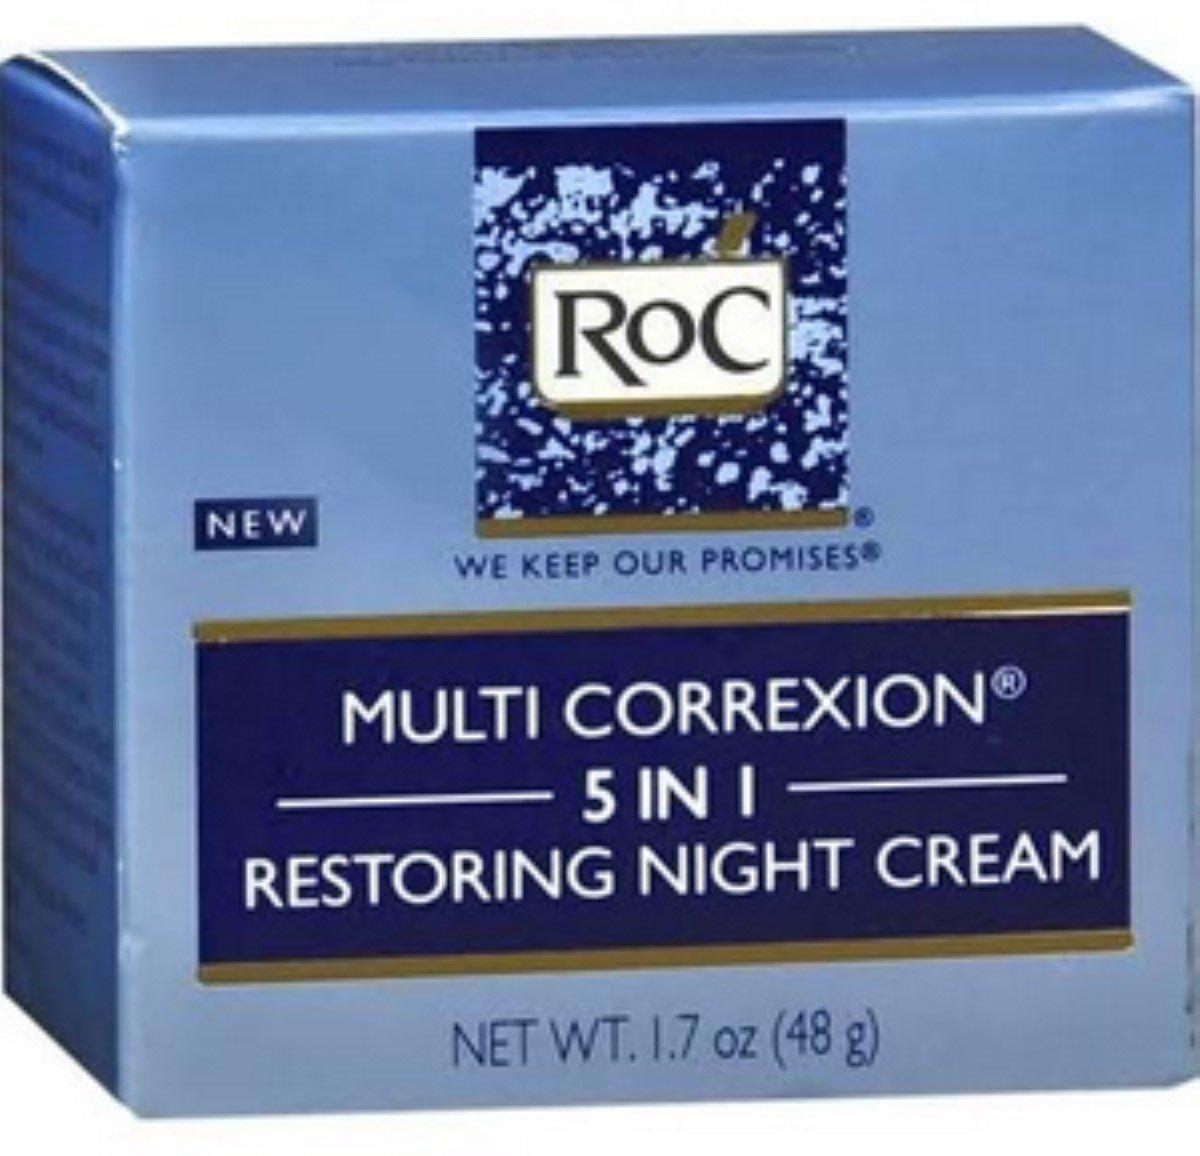 RoC Multi Correxion 5 in 1 Restoring Night Cream, 1.7 oz (Pack of 2) J&J